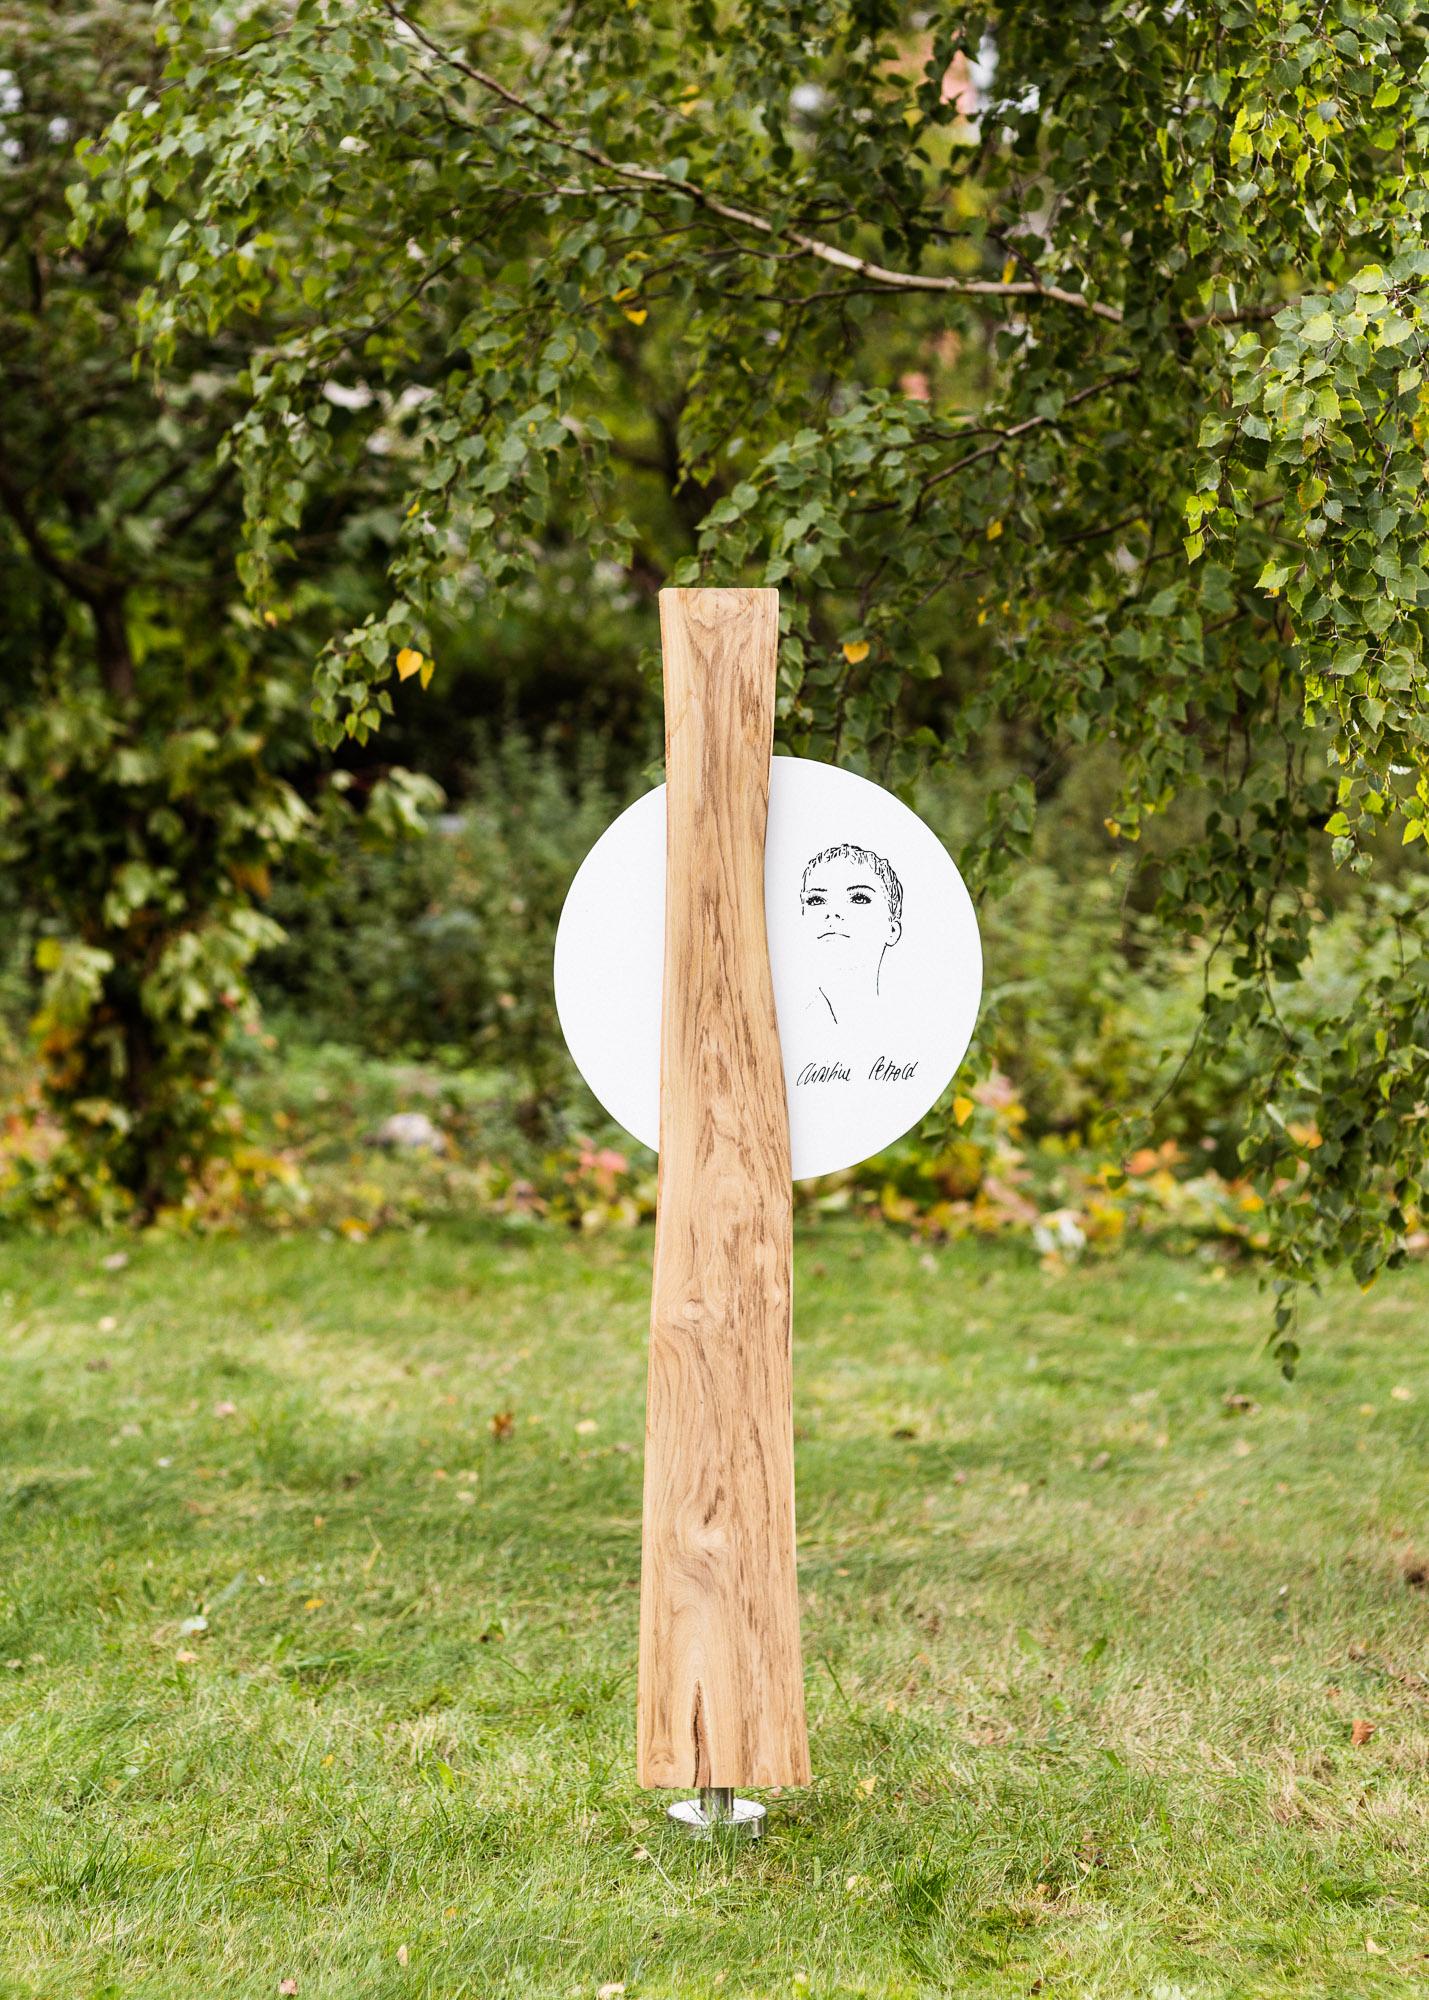 Naturholz Grabmal mit Emailleschild hintersetzt